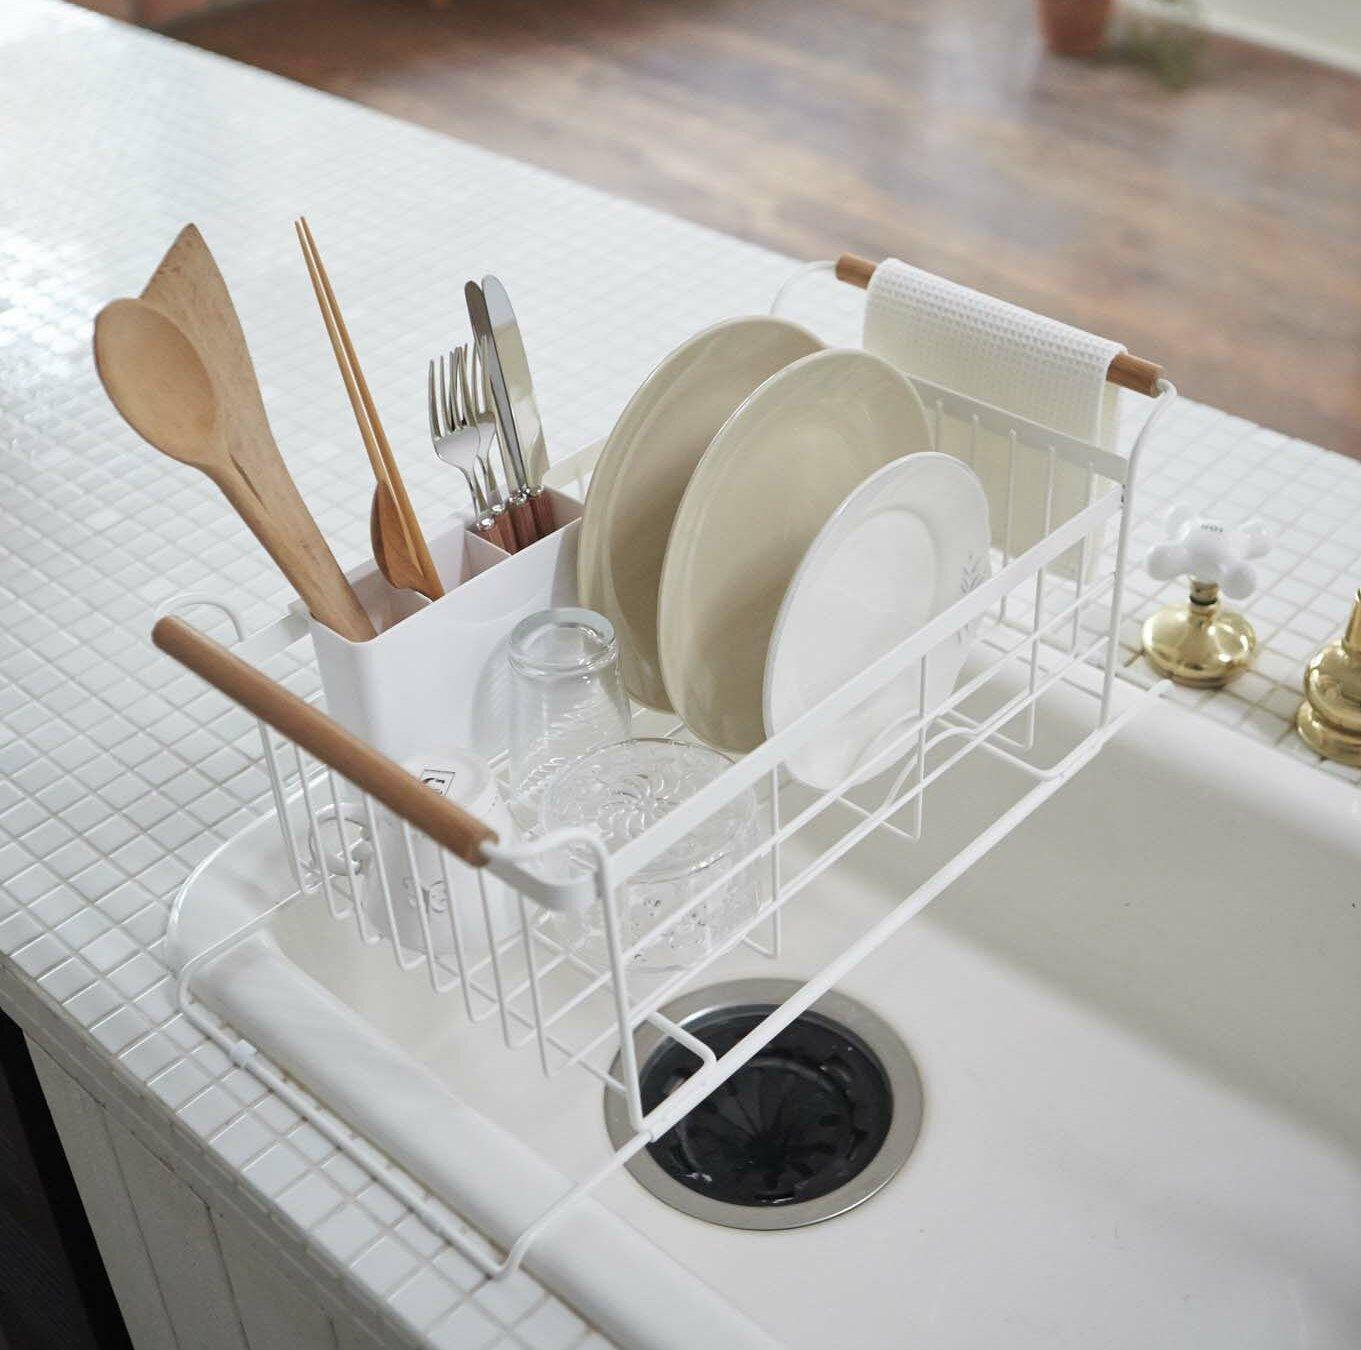 Corrigan Studio Jamari Over-the-Sink Dish Drainer Rack & Reviews ...